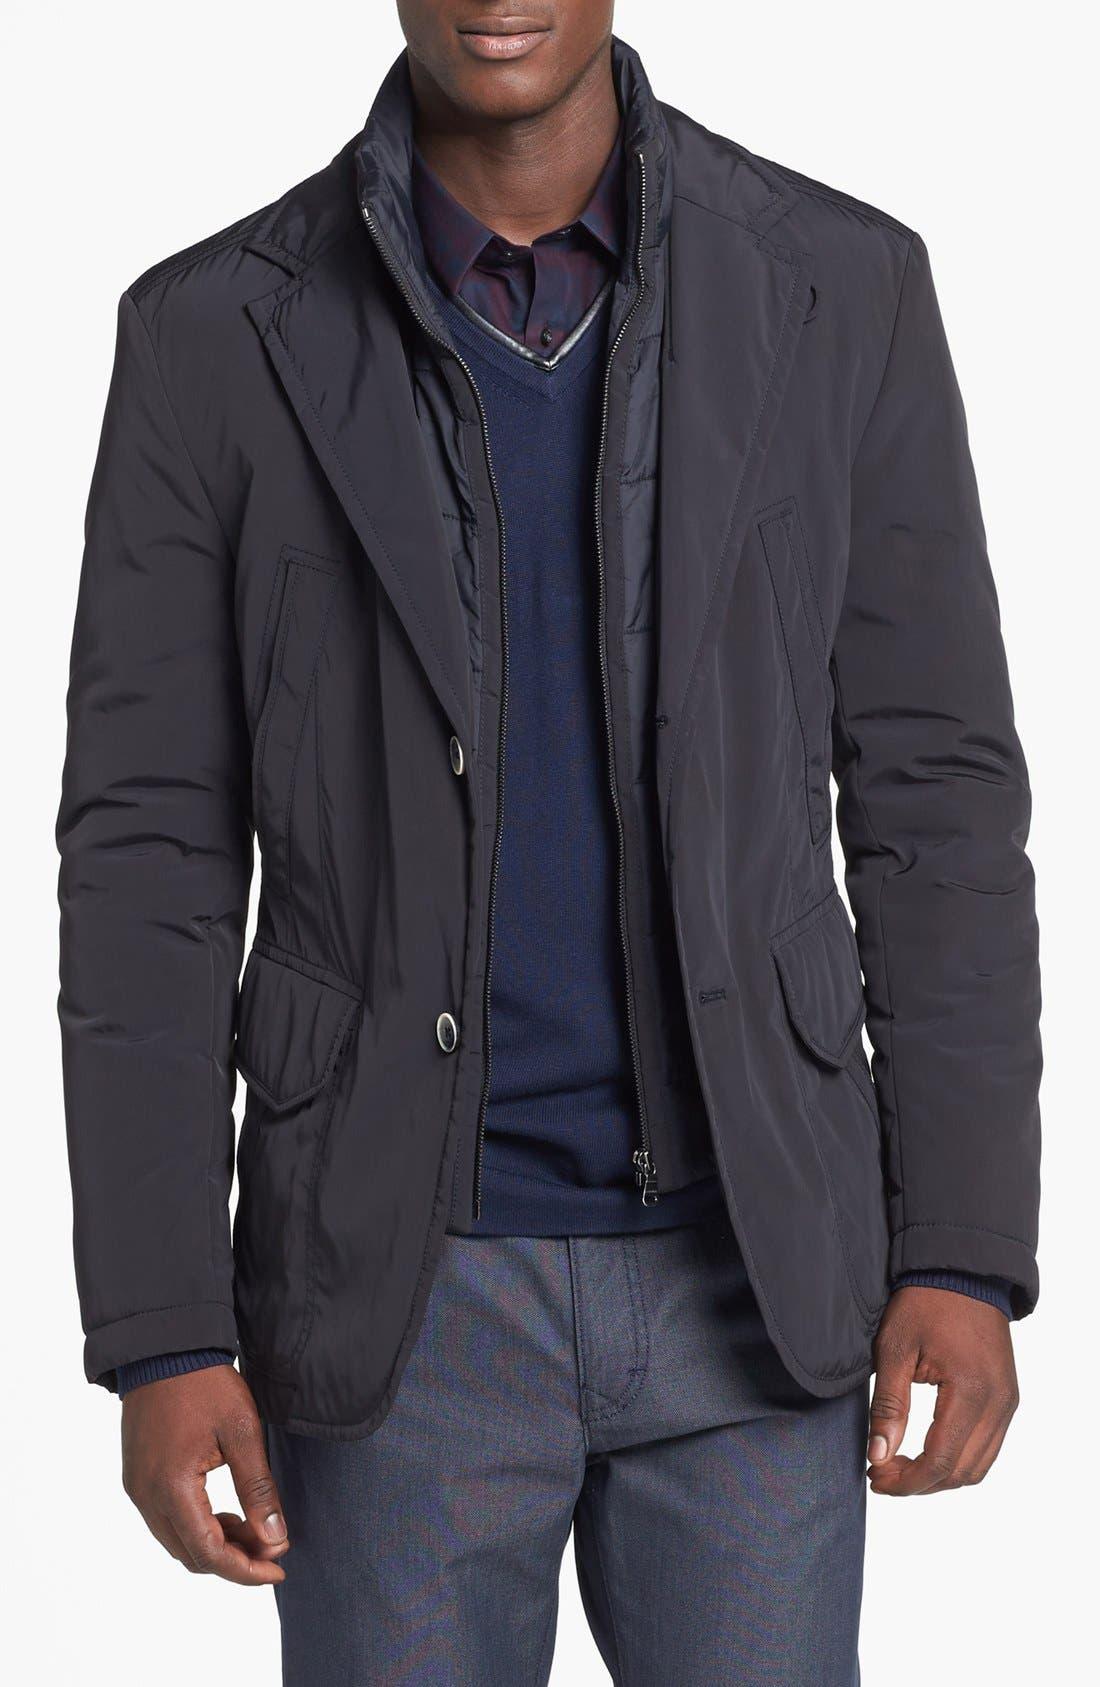 Main Image - BOSS HUGO BOSS 'Cartinus' Jacket